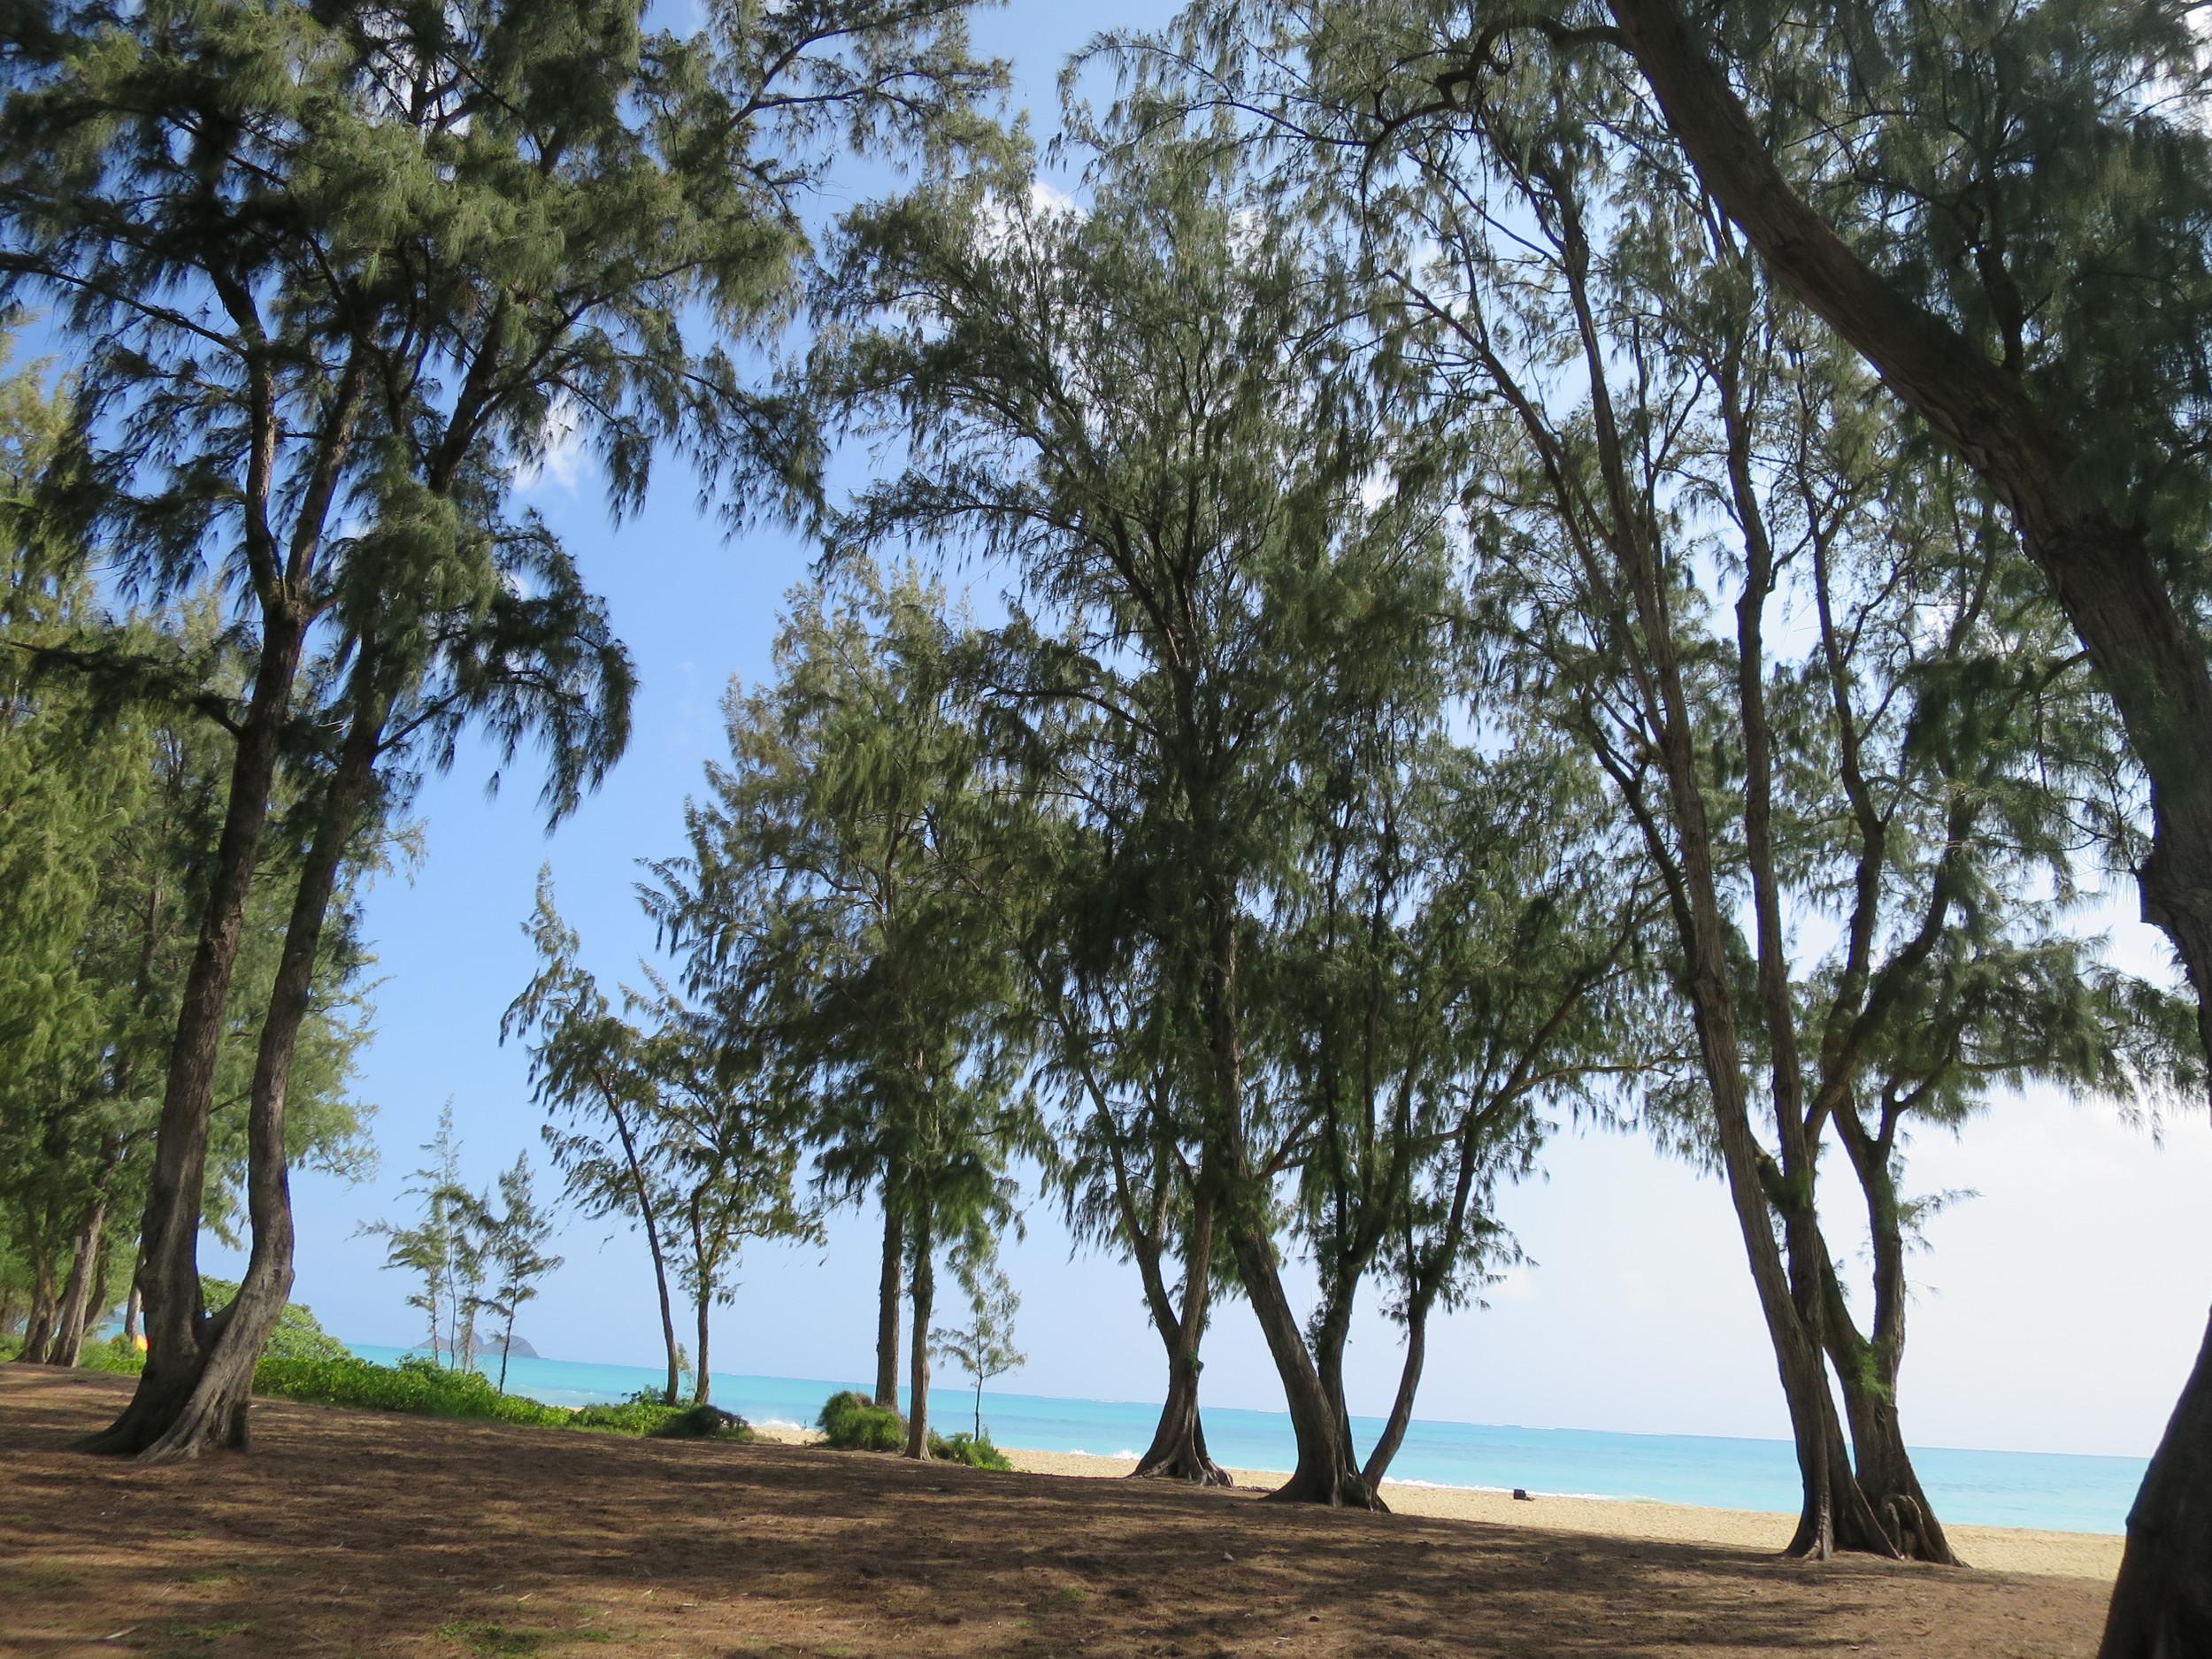 sherwood-forrest-hawaii